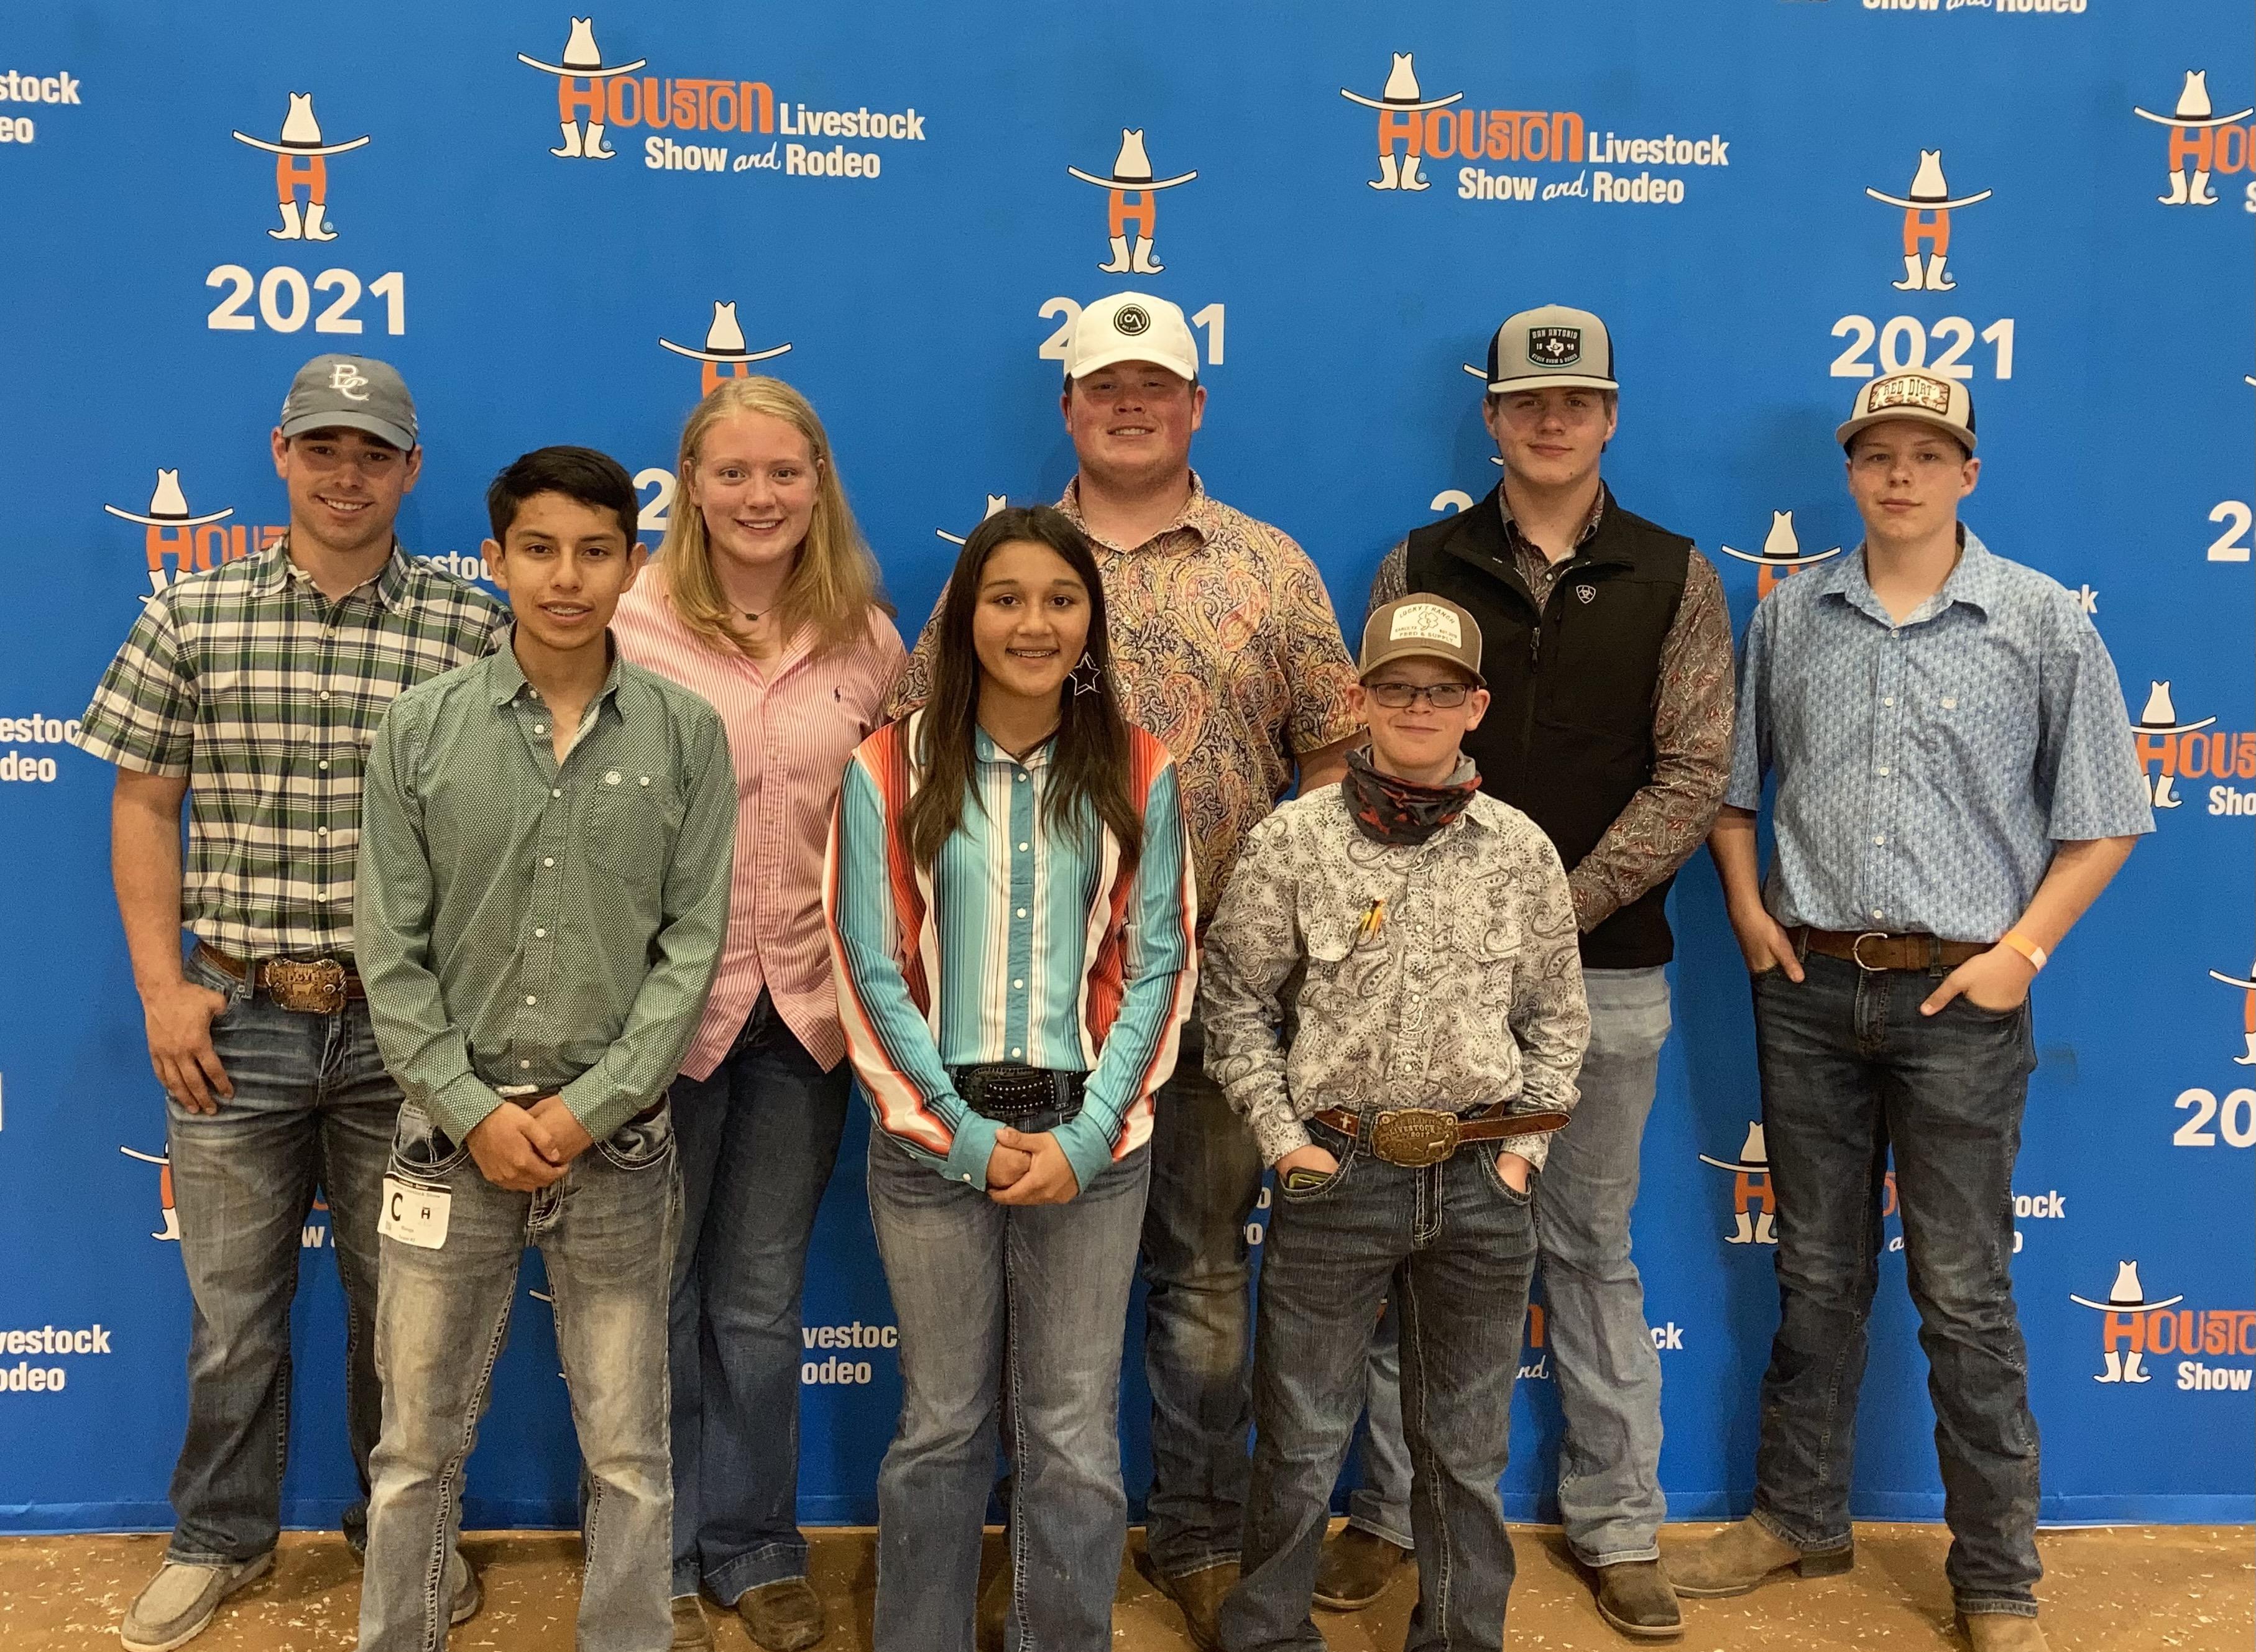 Livestock Team HLSR 2021